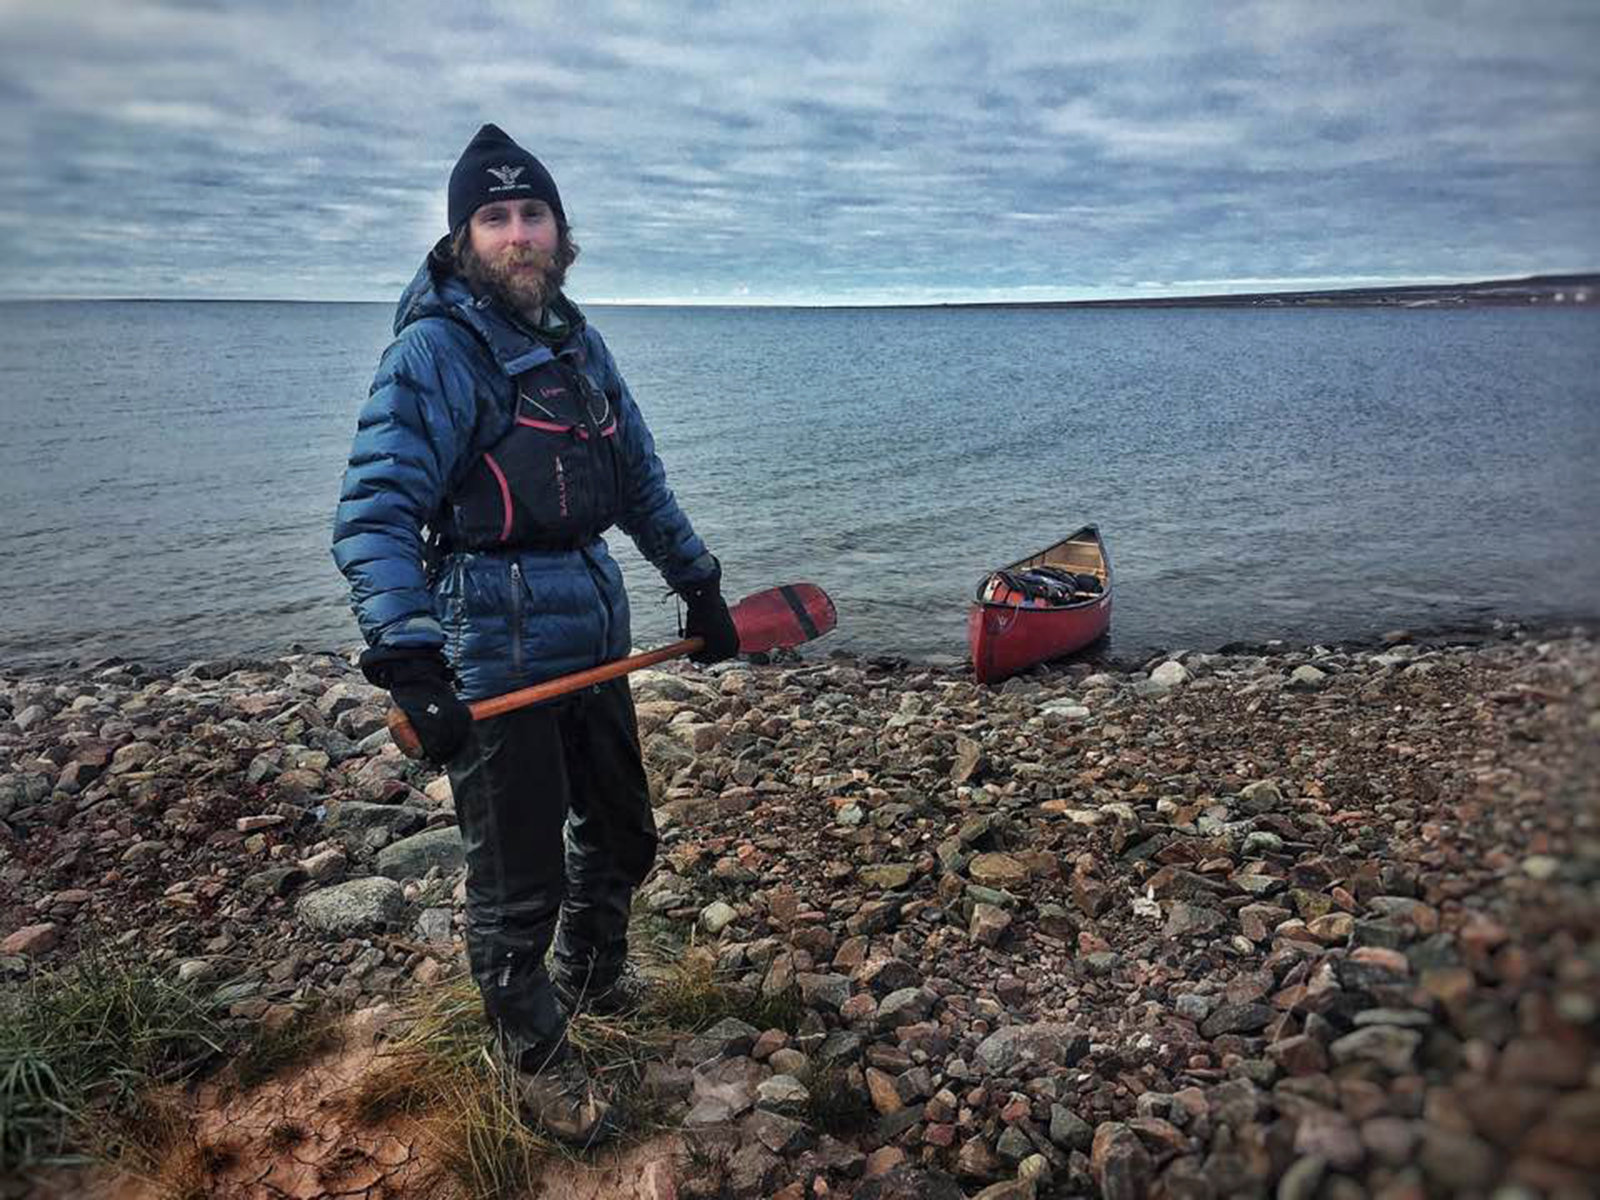 Exclusive: Adam Shoalts on his epic Trans-Canadian Arctic